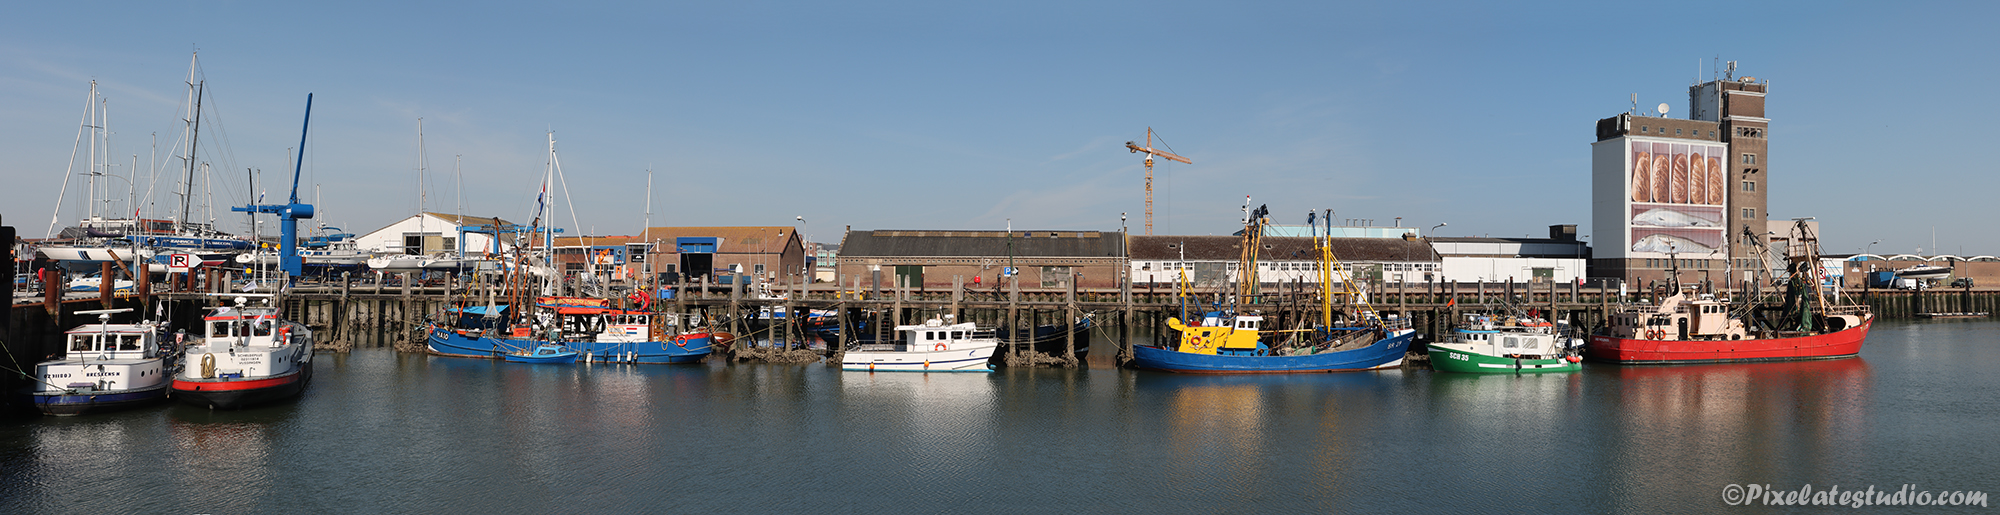 Panorama foto van de vissershaven in Breskens